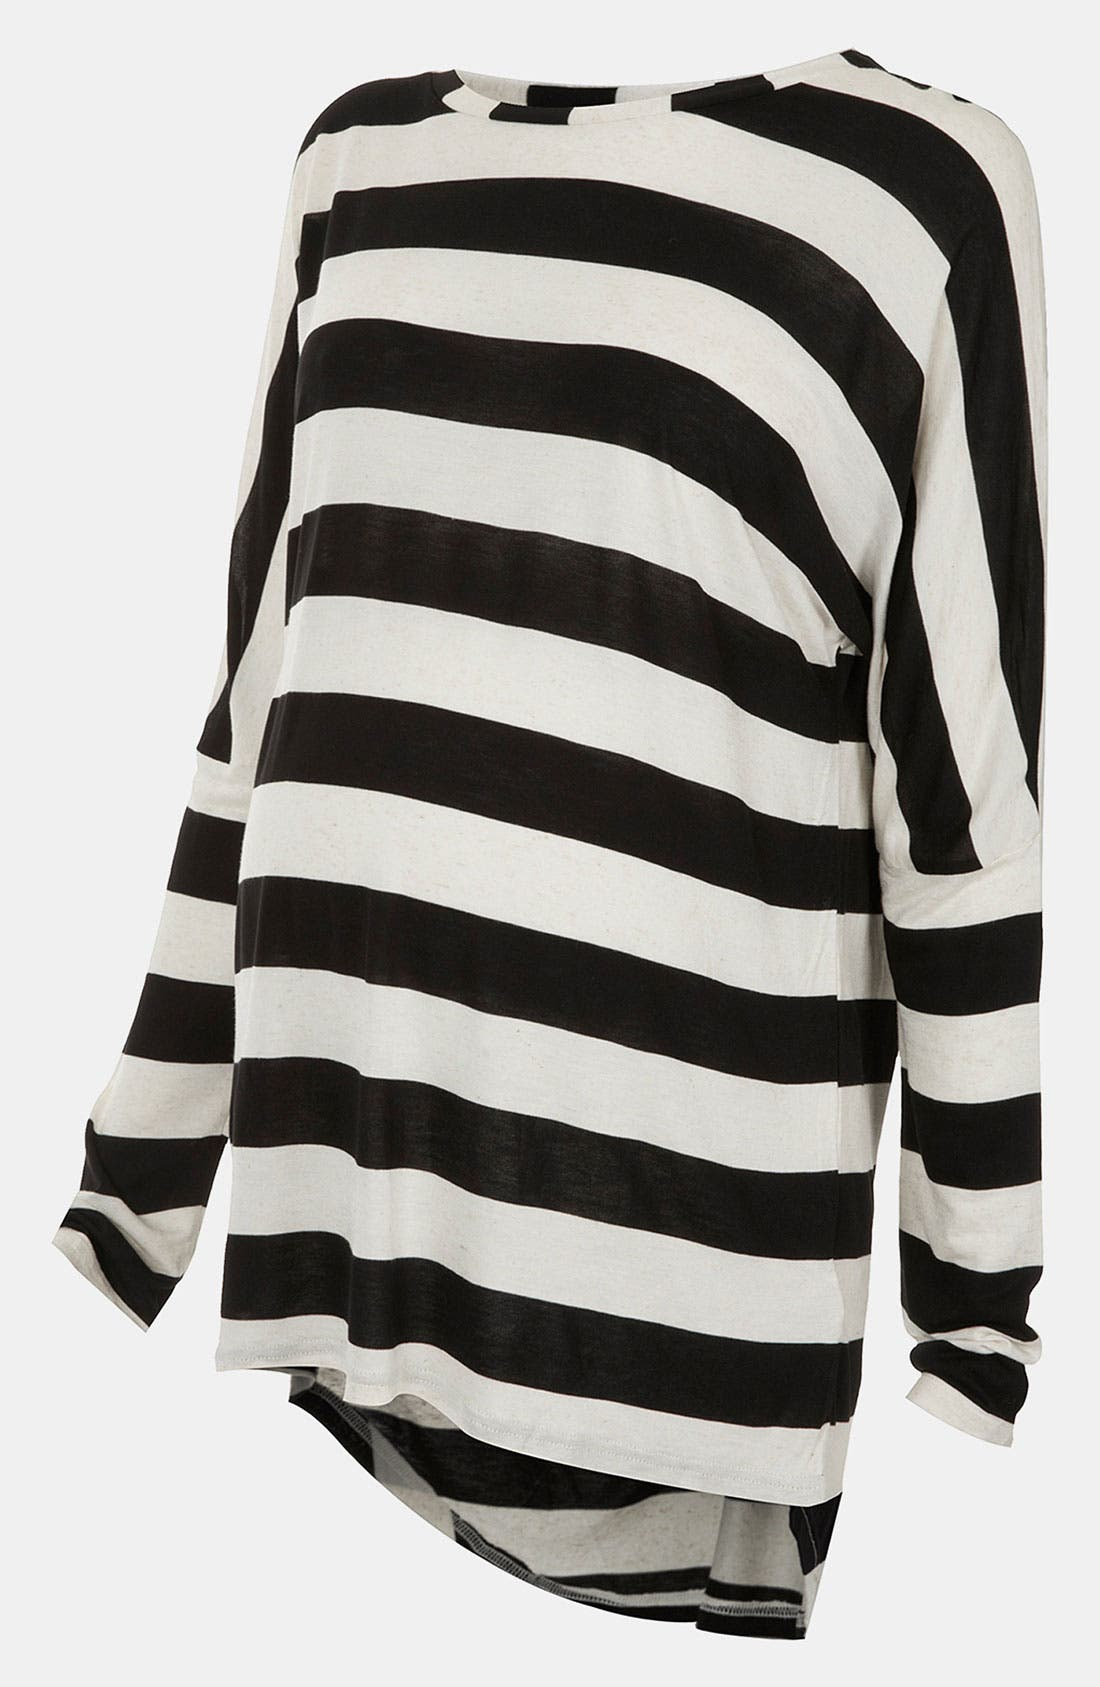 Alternate Image 1 Selected - Topshop Stripe Slubbed Maternity Top